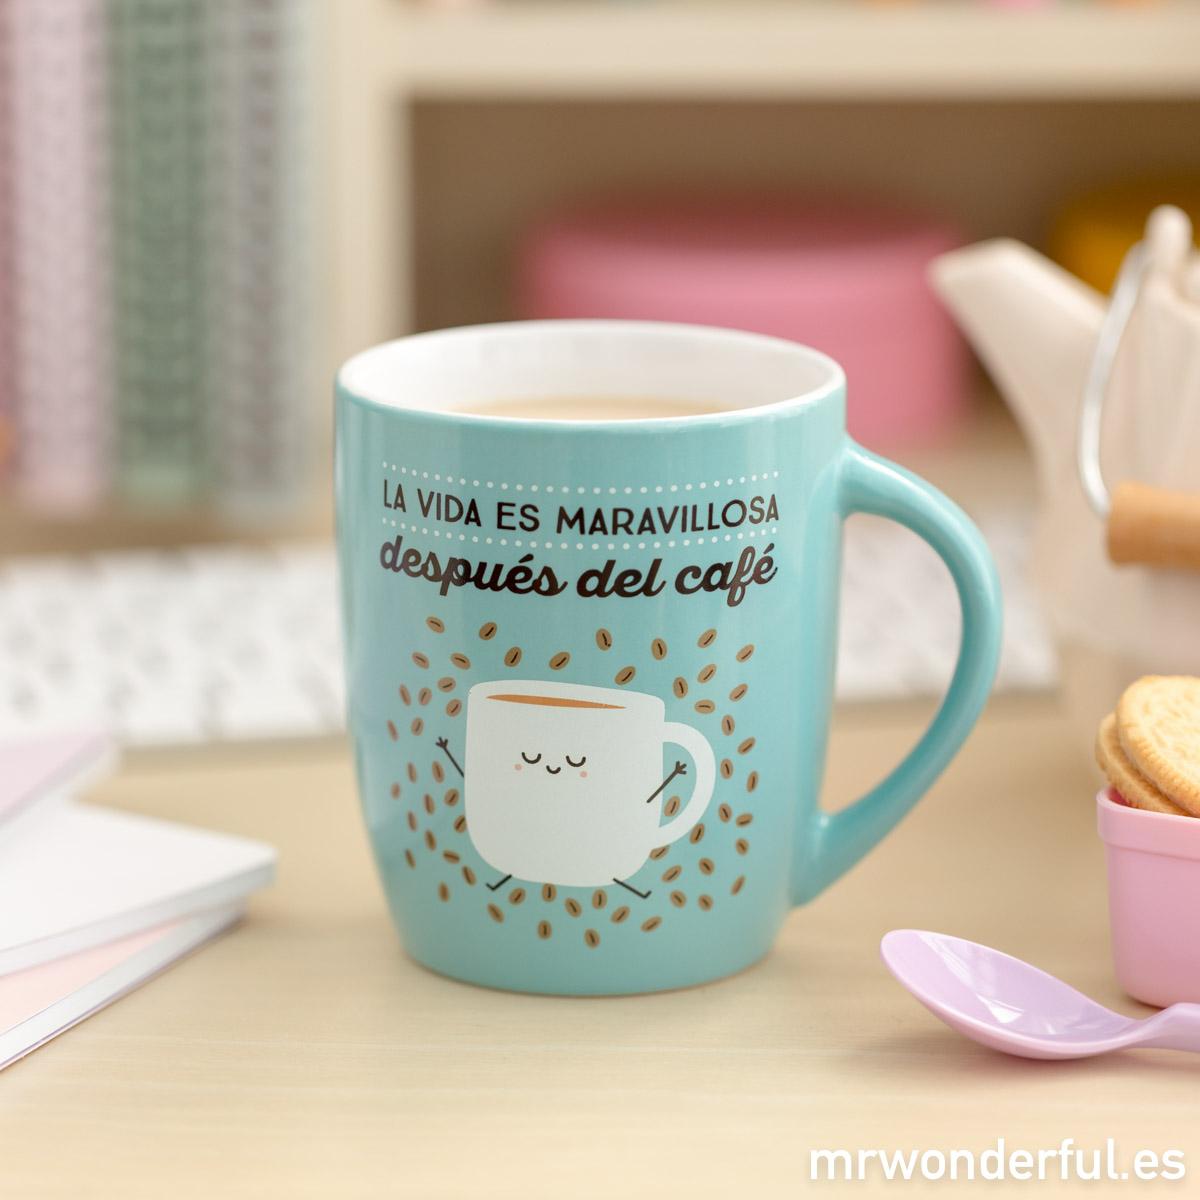 mrwonderful_8435460709071_WOA03774ES_La-vida-es-maravillosa-despues-del-cafe-ES-1